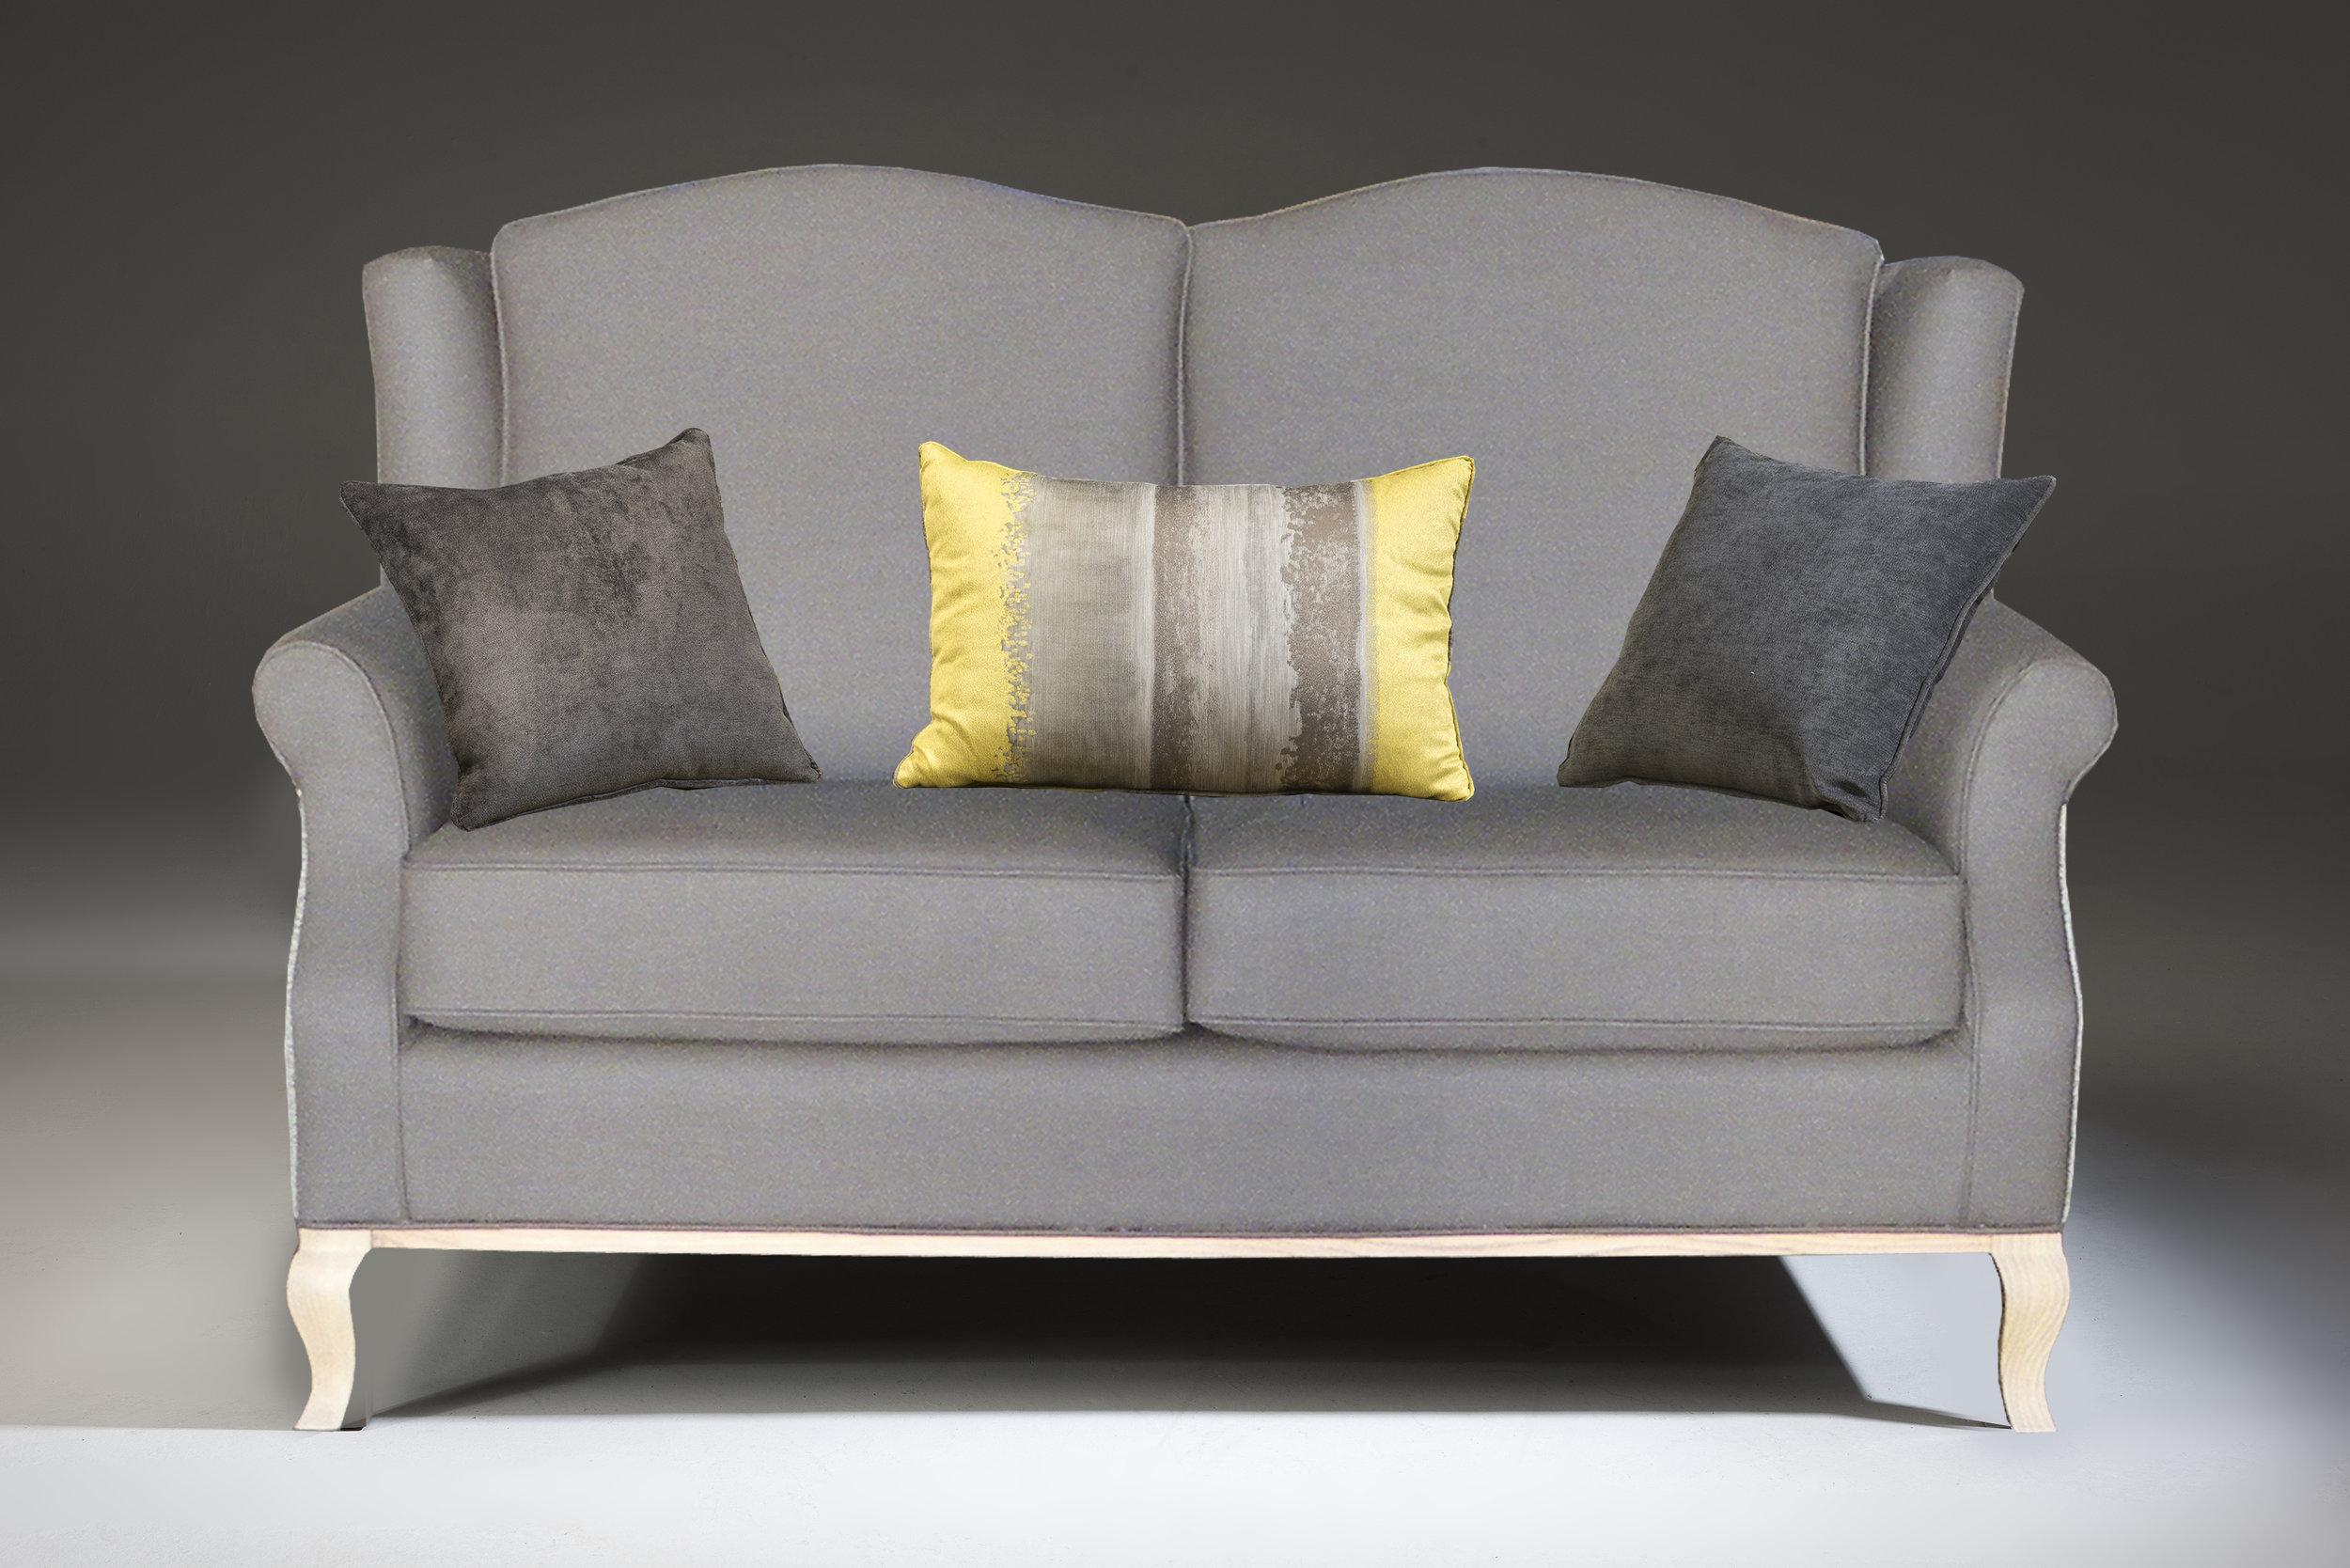 Chartwell sofa3.jpg